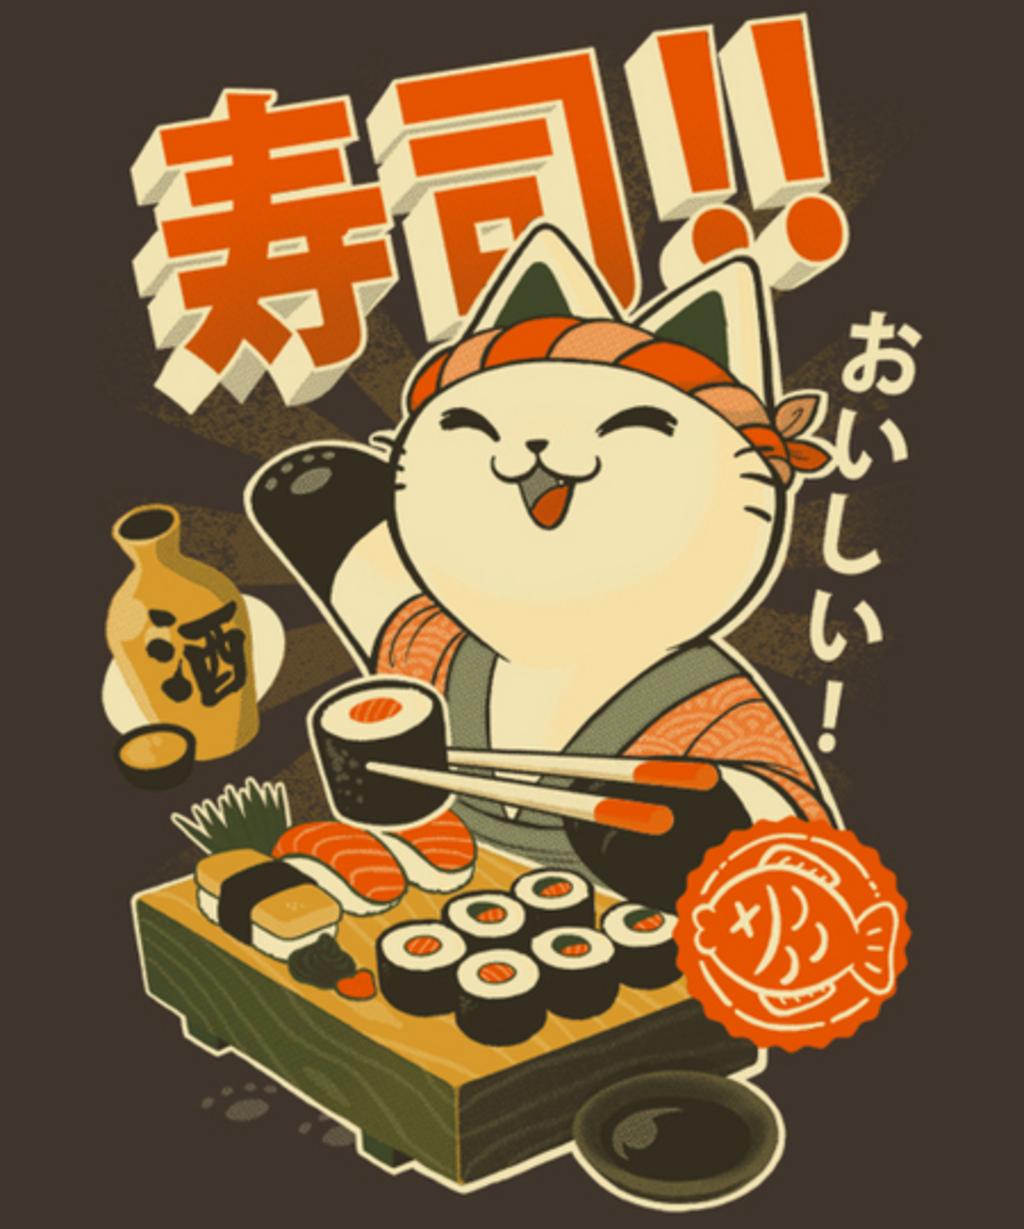 Qwertee: Sushi chef